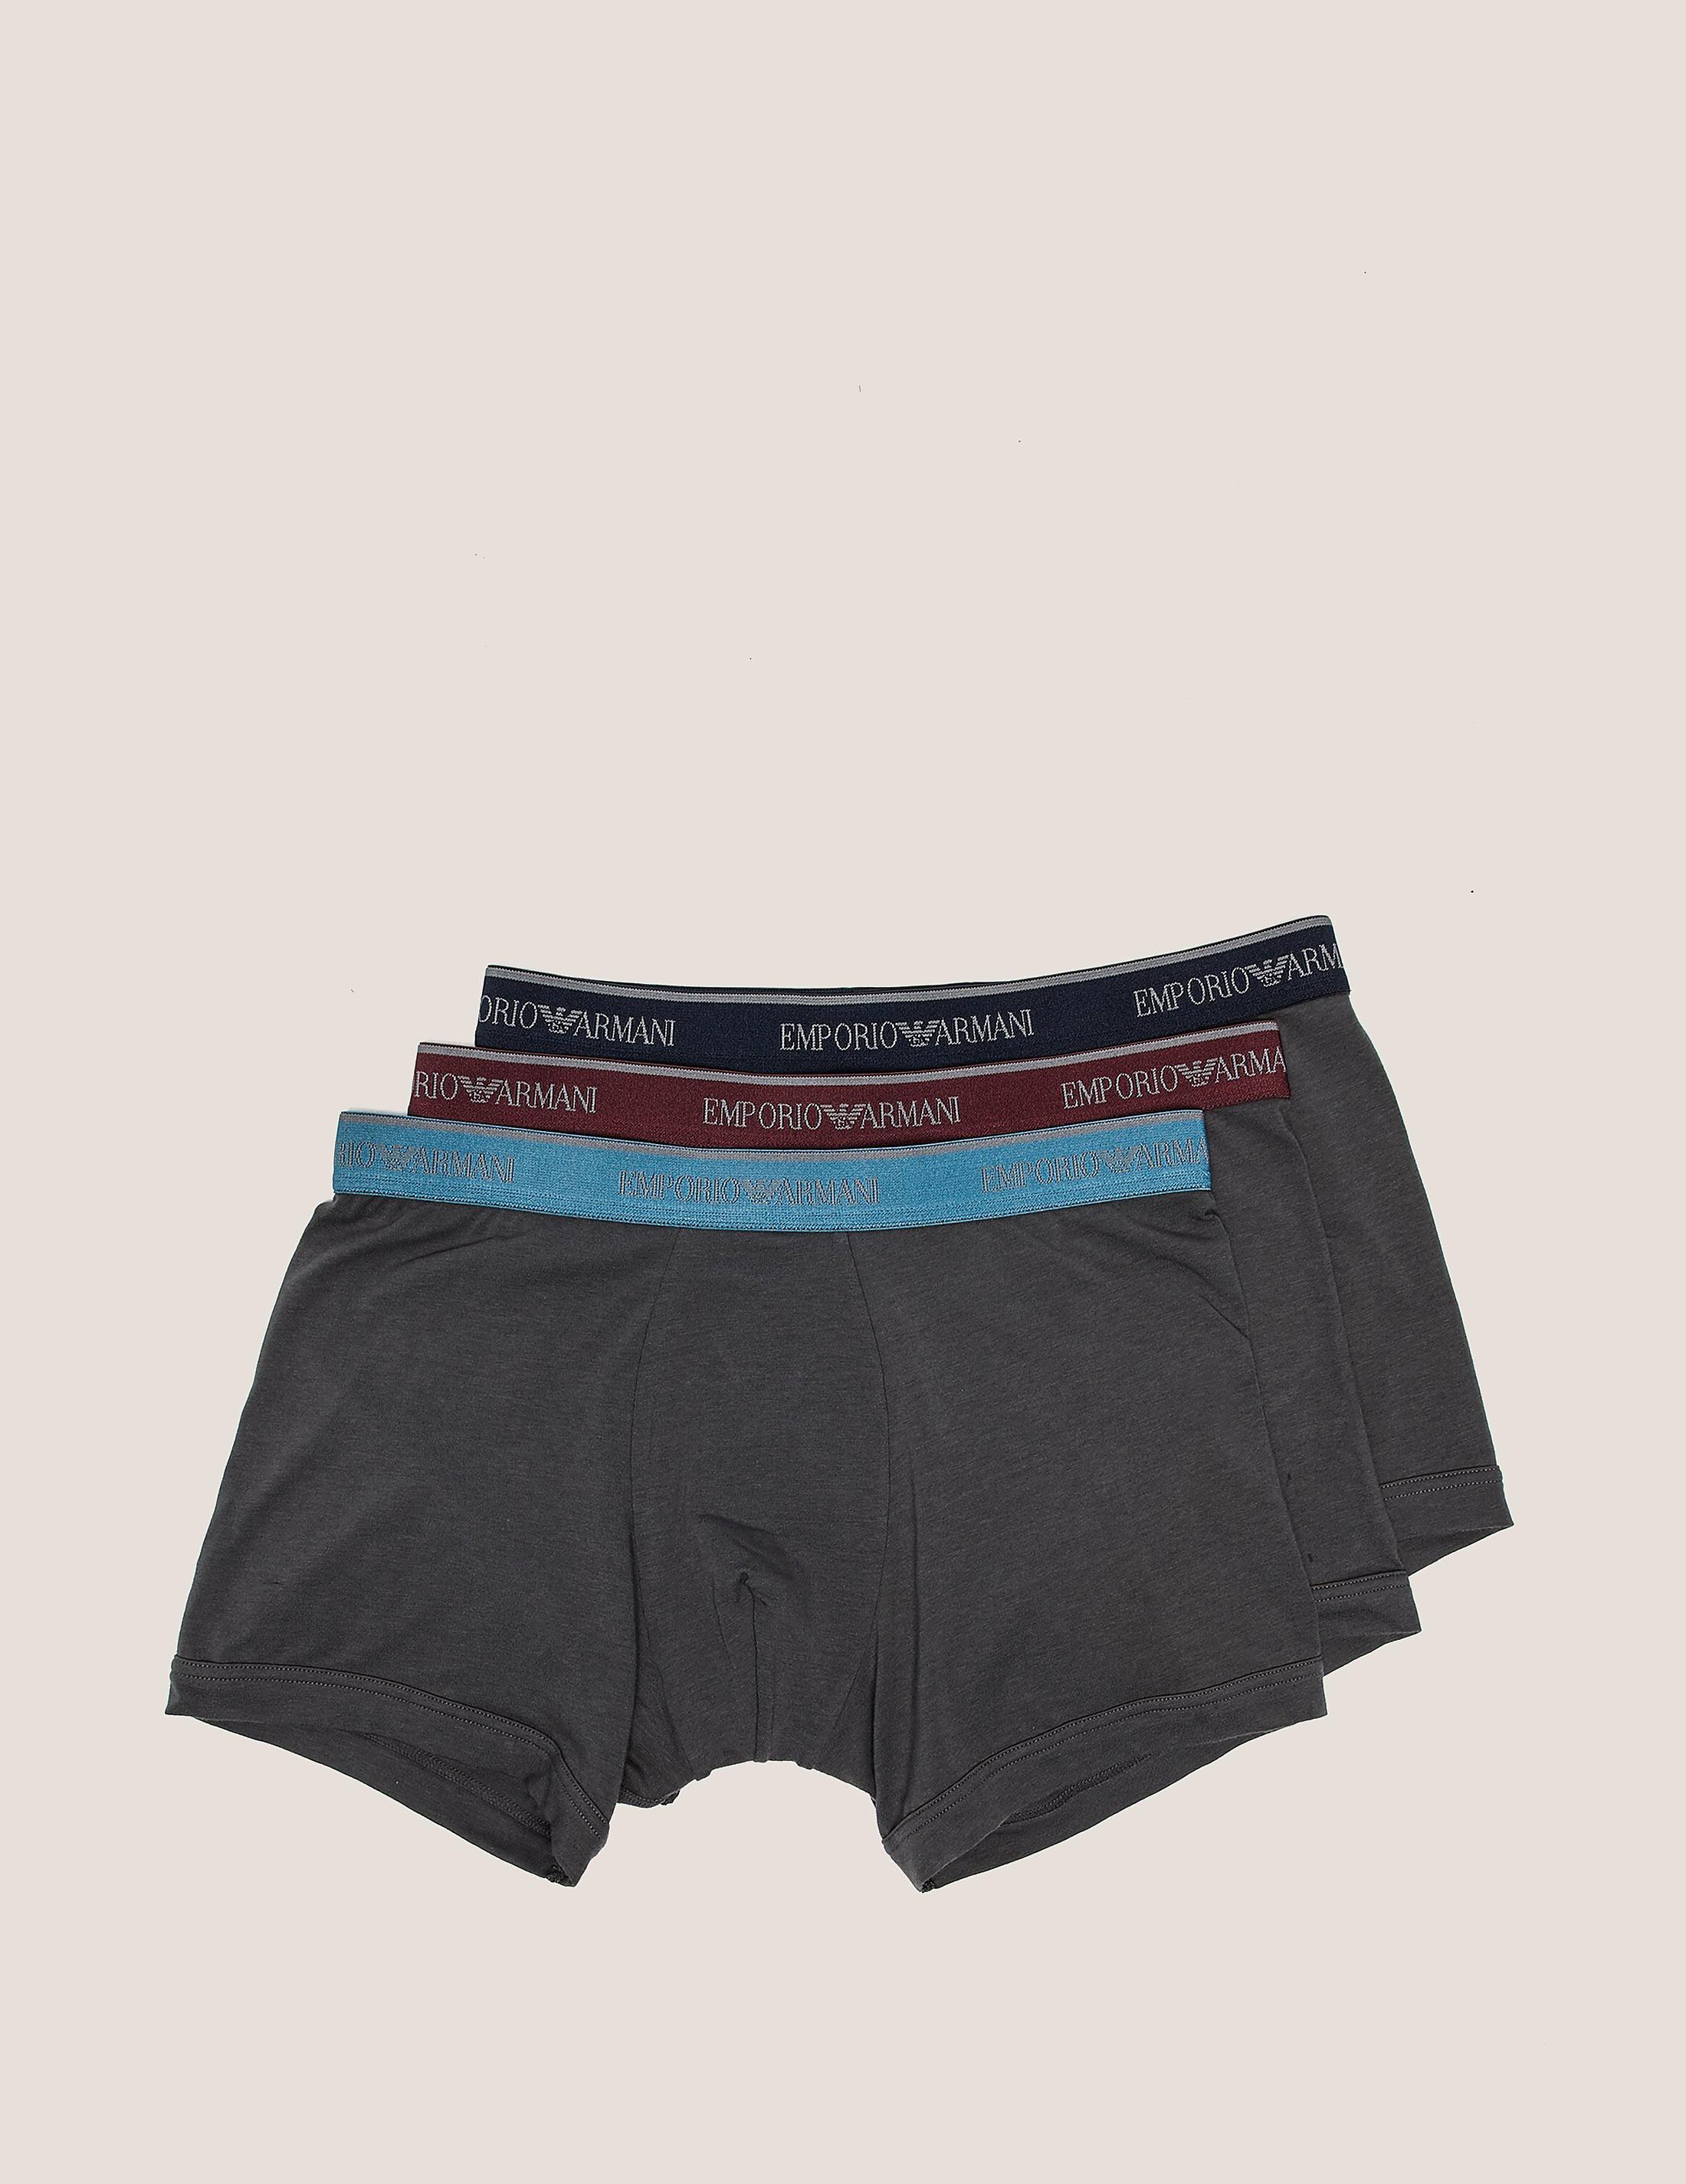 Emporio Armani 3-Pack Boxer Shorts